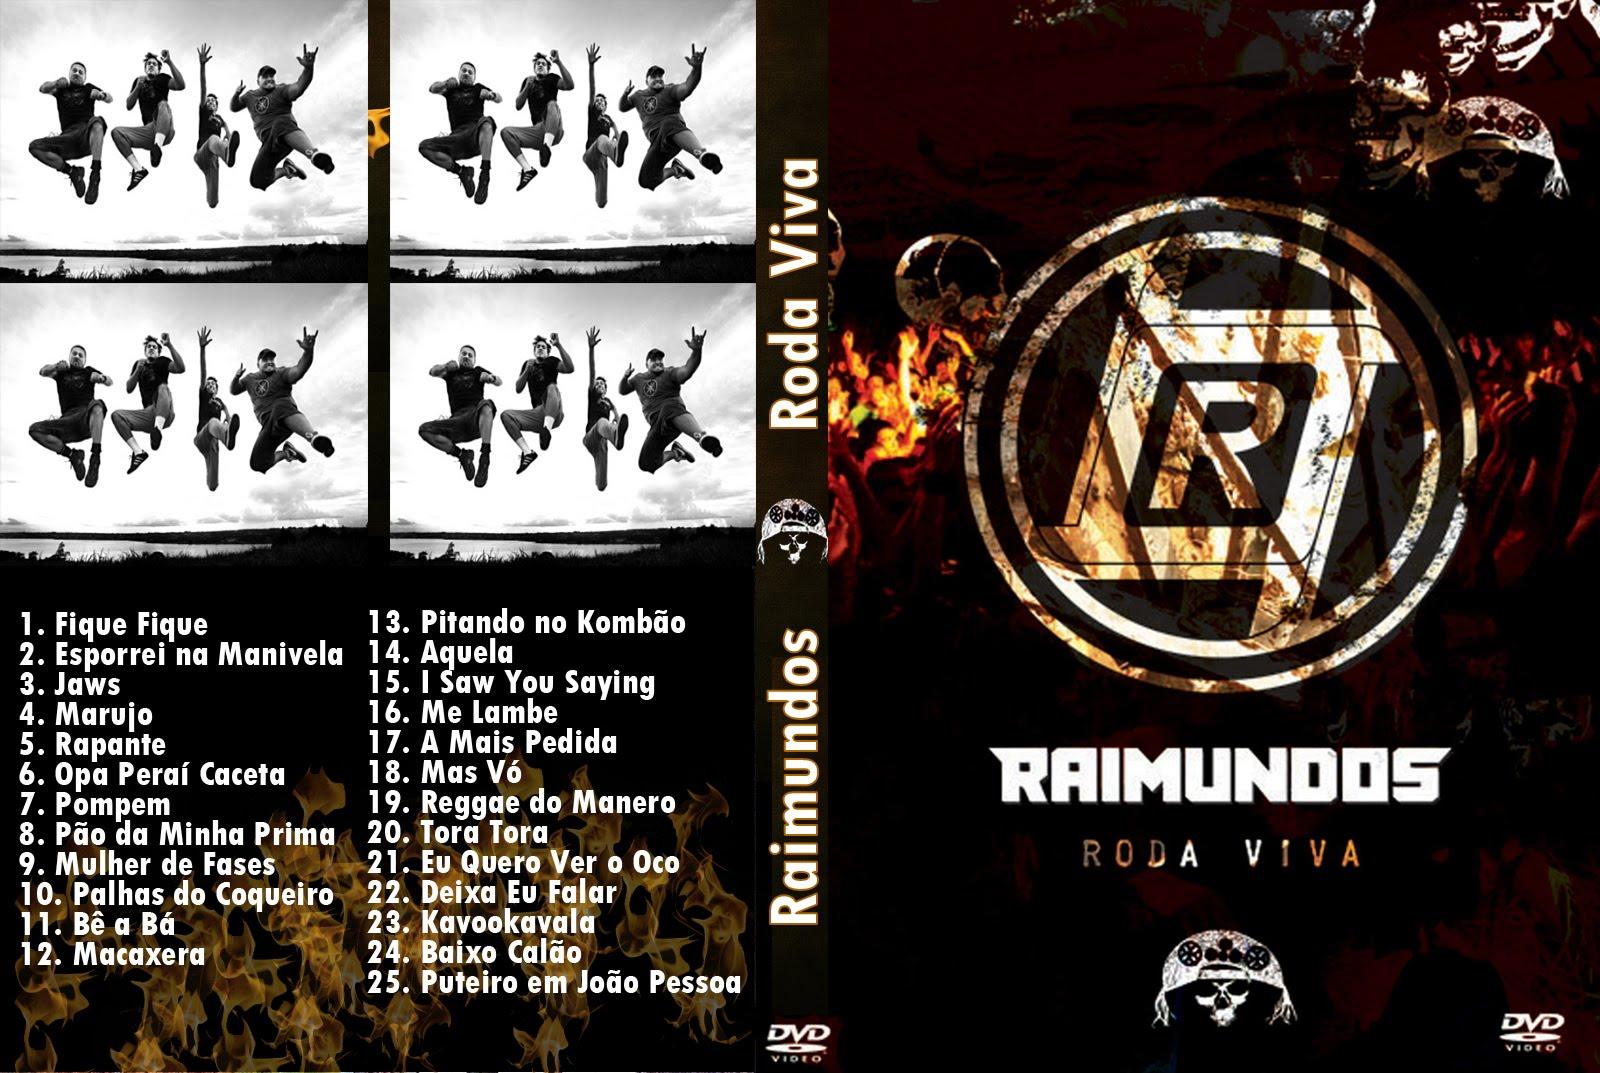 Raimundos Roda Viva DVDRip XviD (2011) Raimundos 2BRoda 2BViva